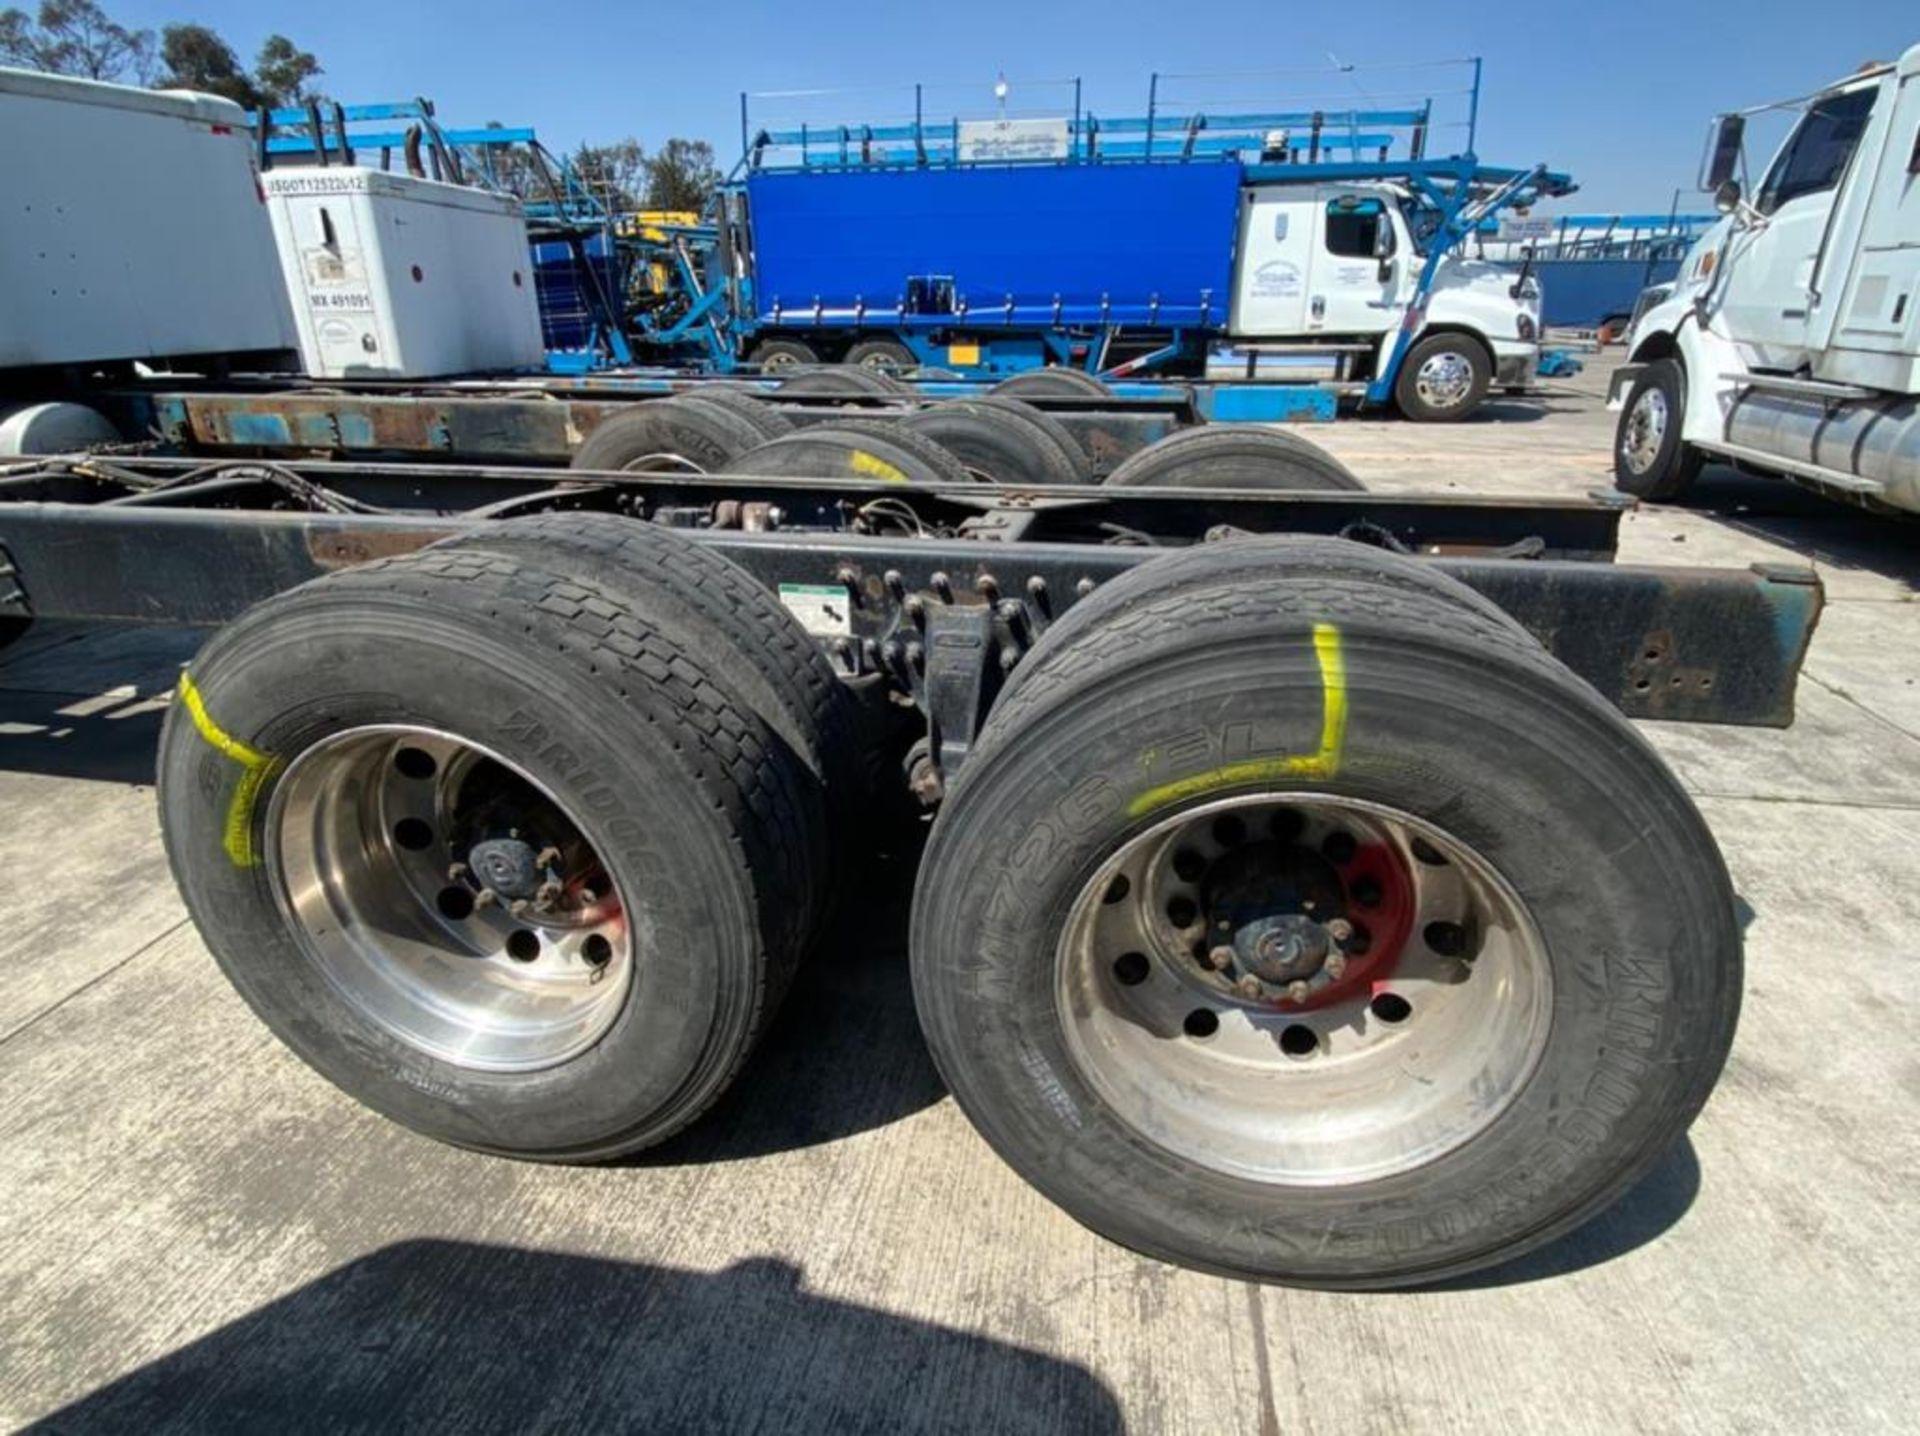 Tractocamión Marca STERLING, LT9500, Modelo 2001 - Image 13 of 27